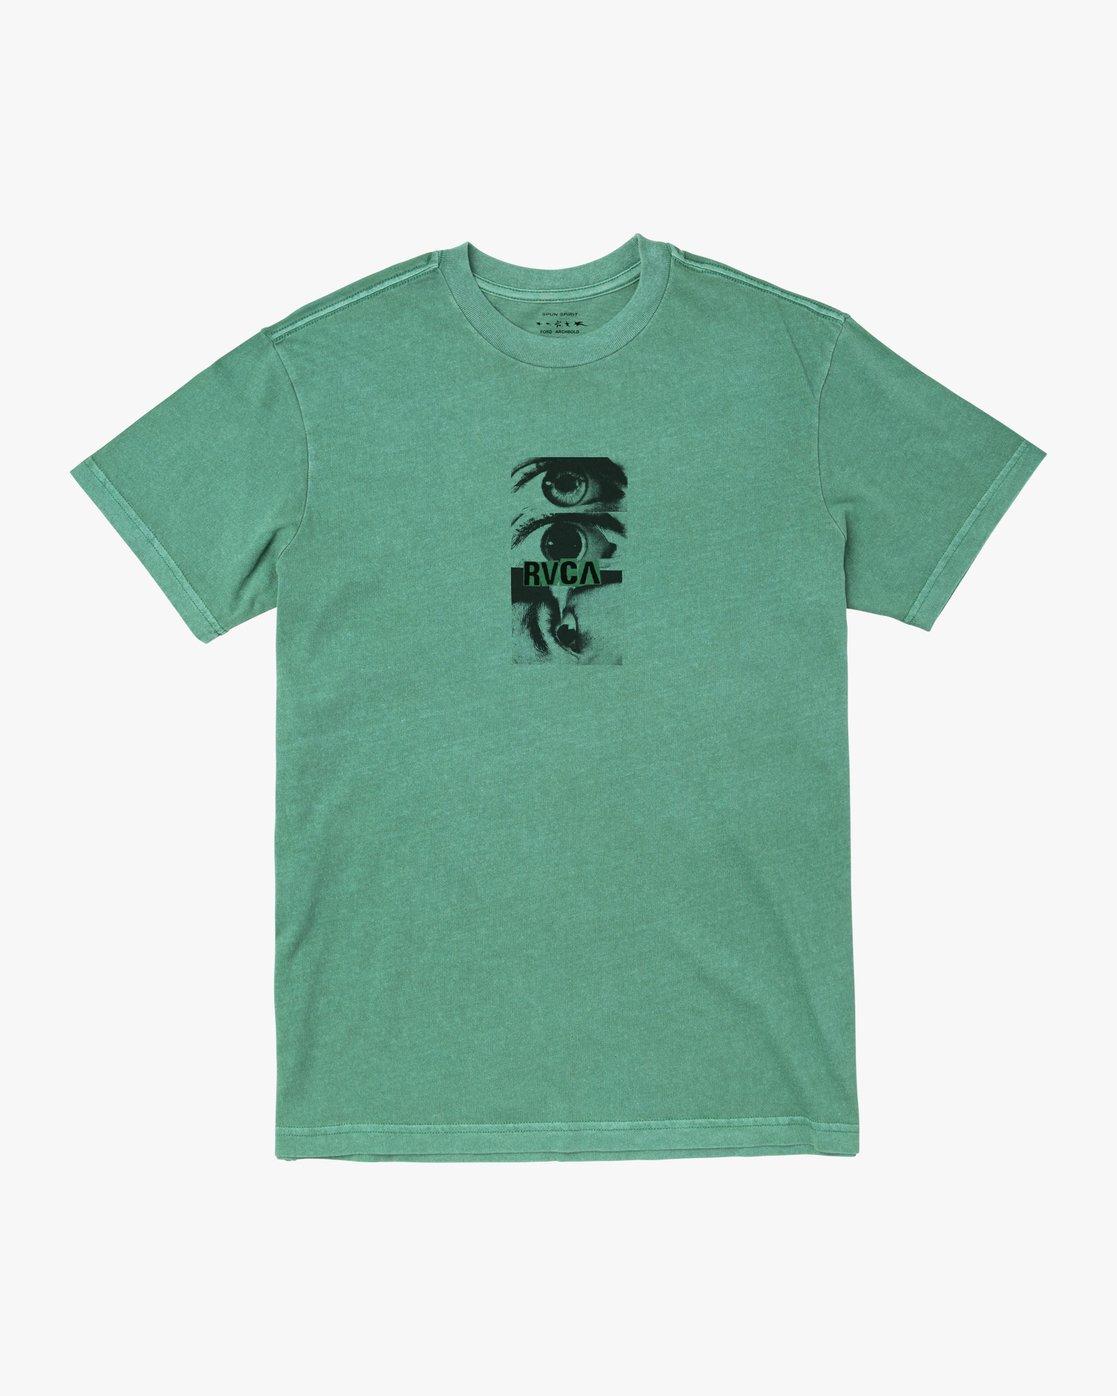 0 EYES TEE Green M4411REY RVCA